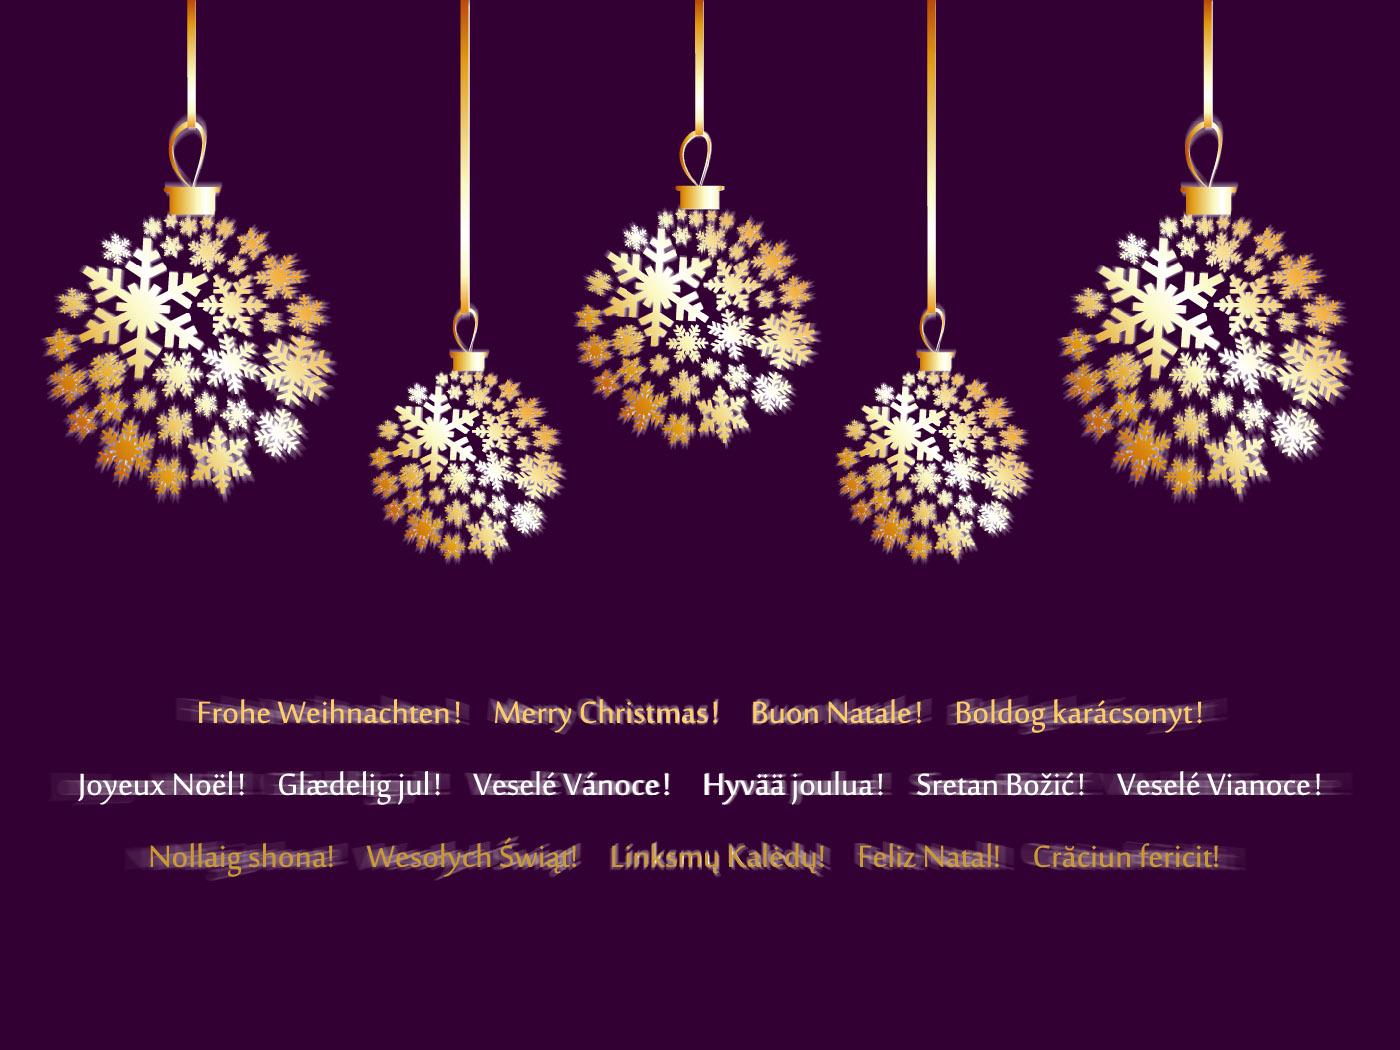 Weihnachtsbilder Merry Christmas.Frohe Weihnachten Merry Christmas Hintergrundbilder Für Weihnachten